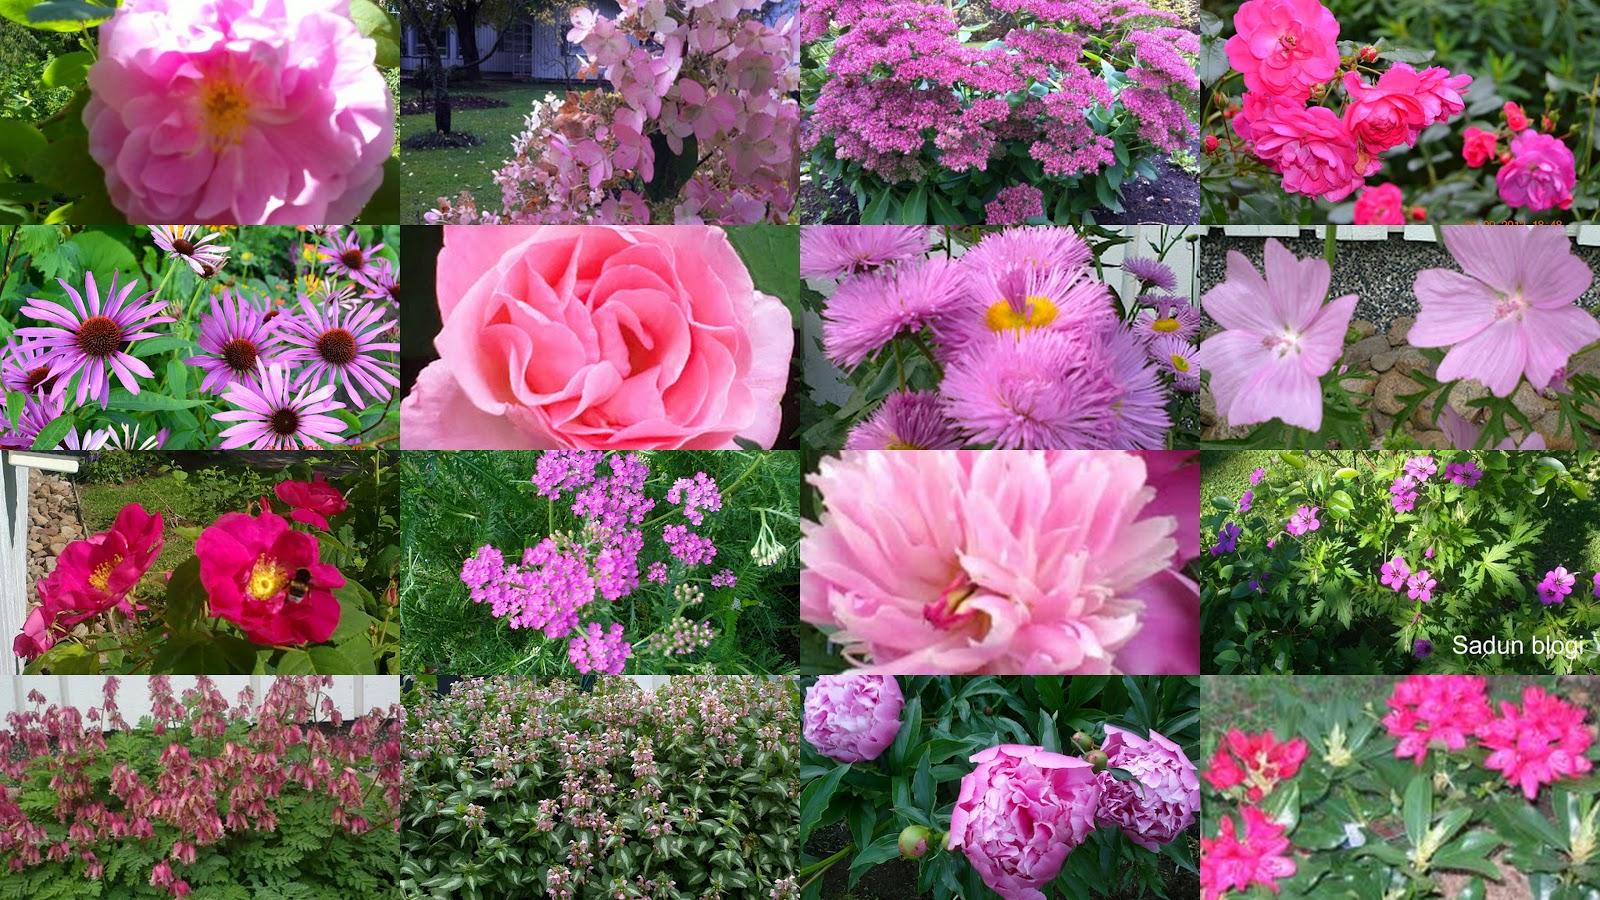 Kukkakollaaseja – Flower collages